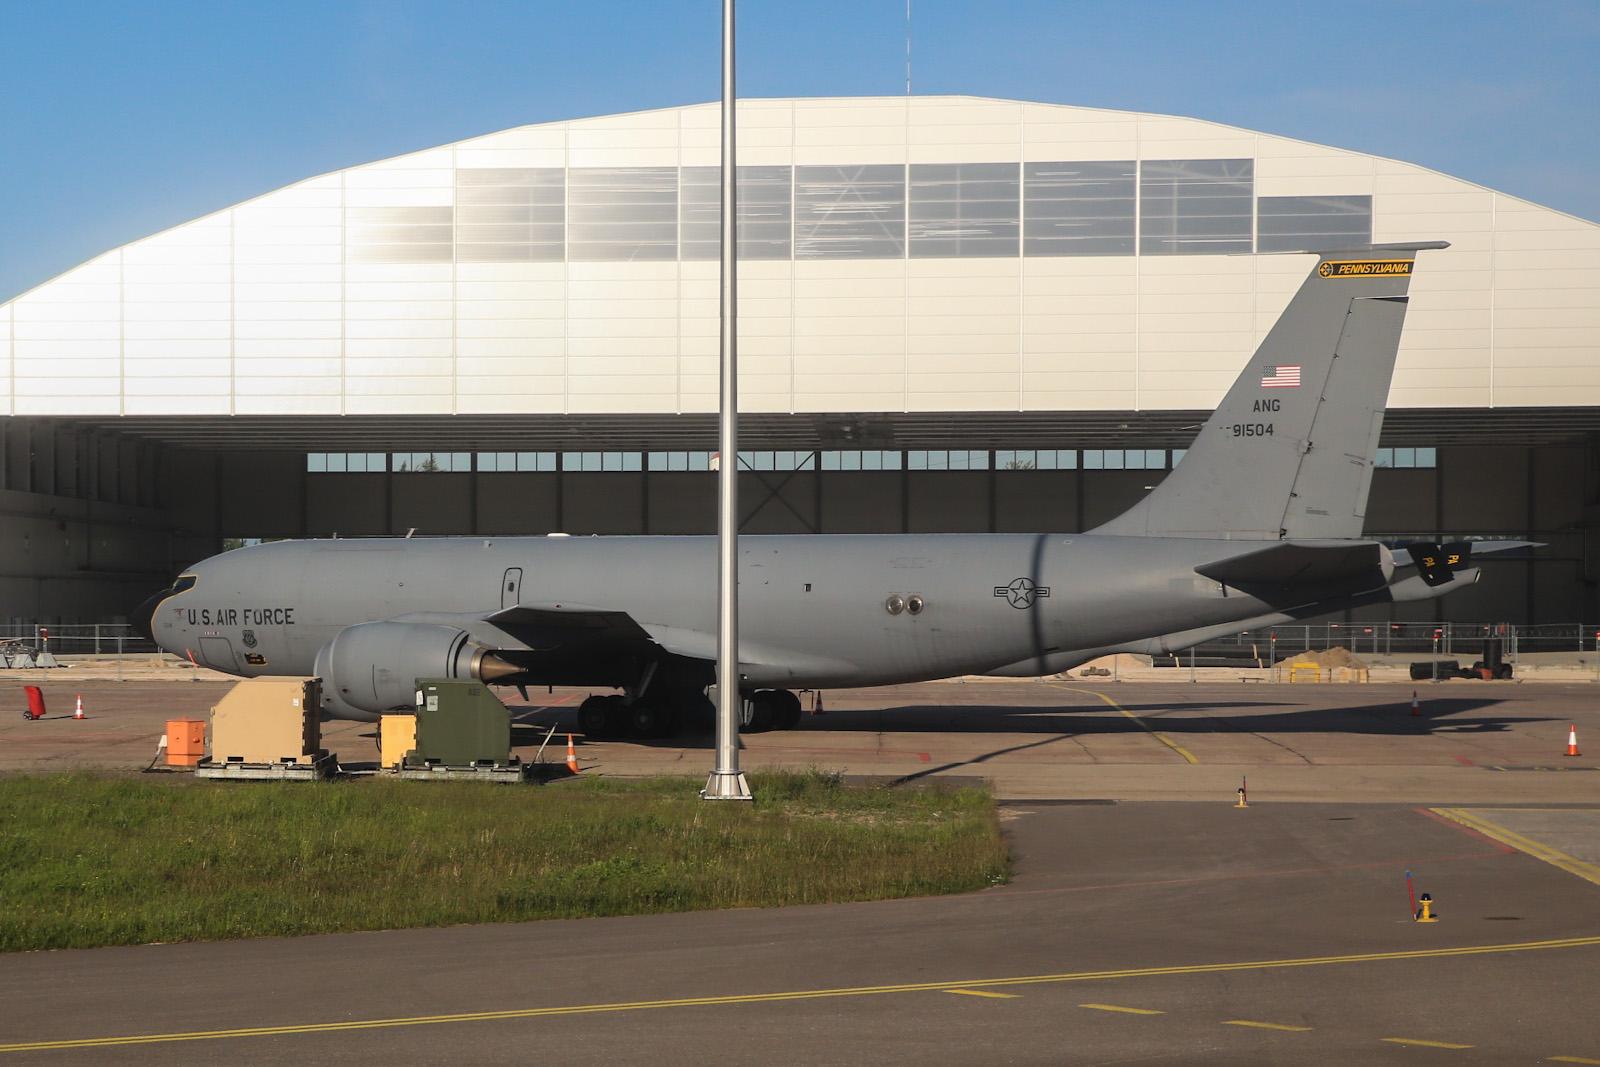 Boeing KC-135 Stratotanker в аэропорту Рига